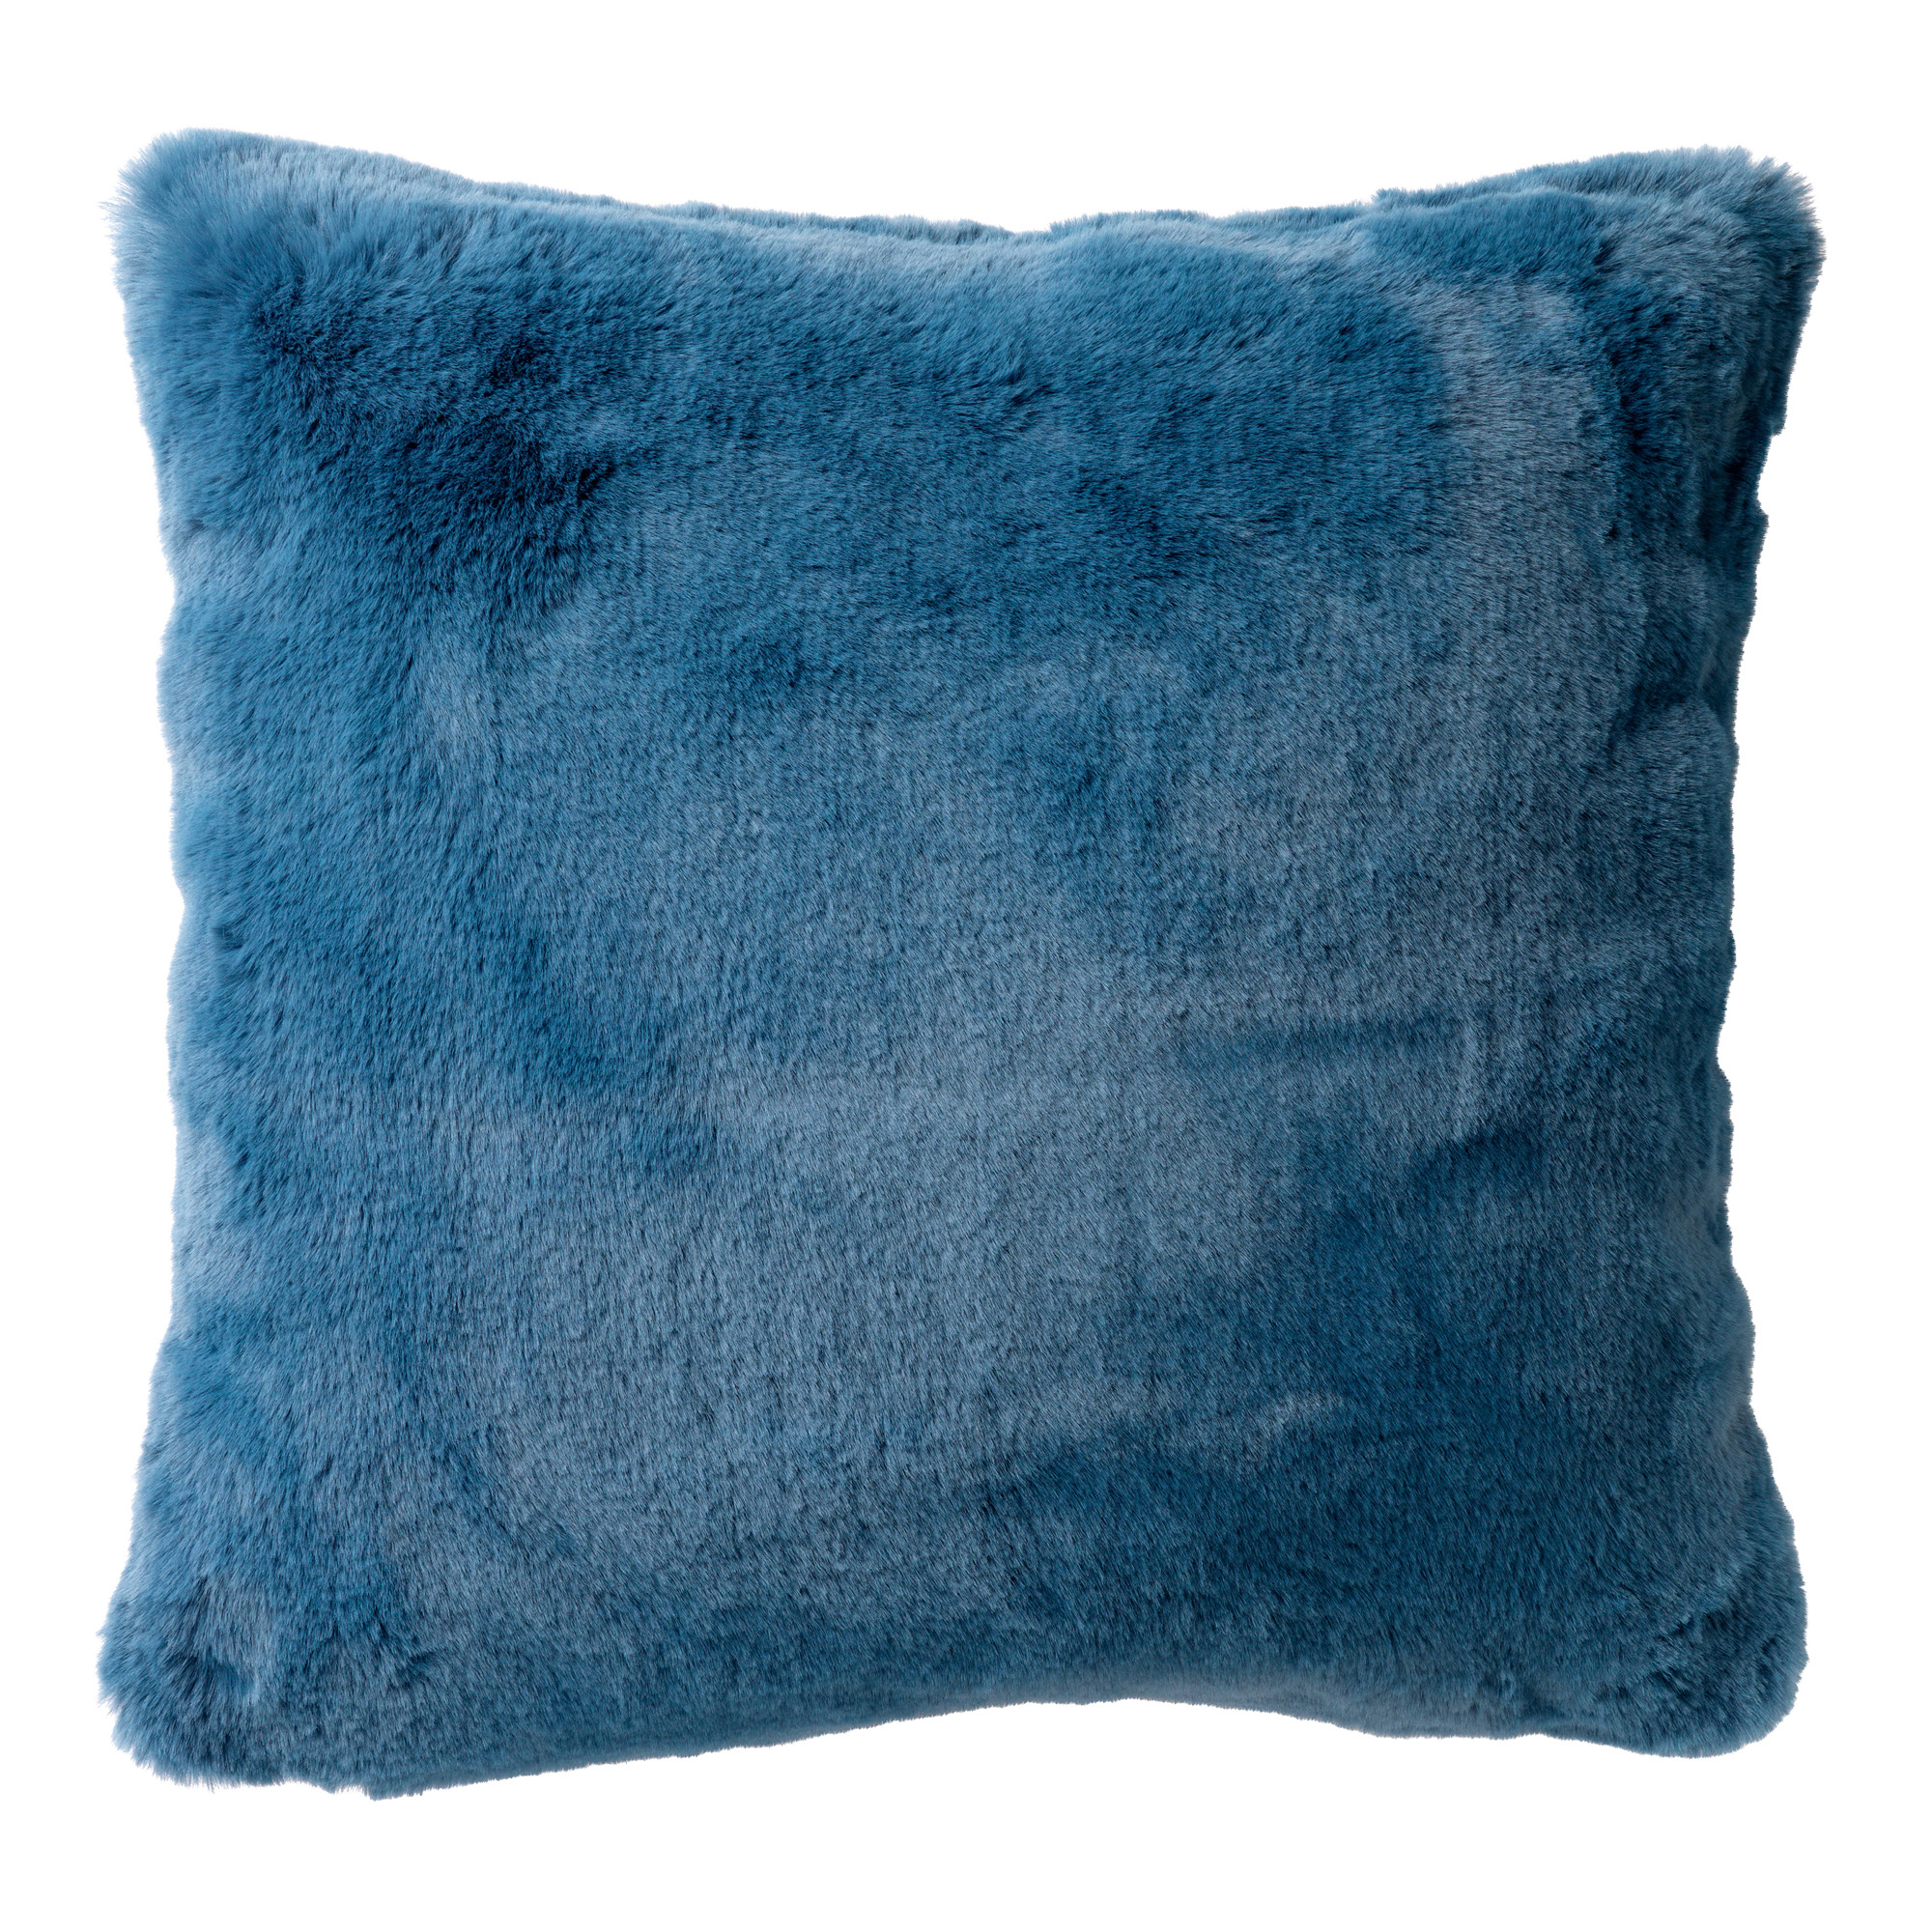 ZAYA - Sierkussen unikleur Provincial Blue 45x45 cm